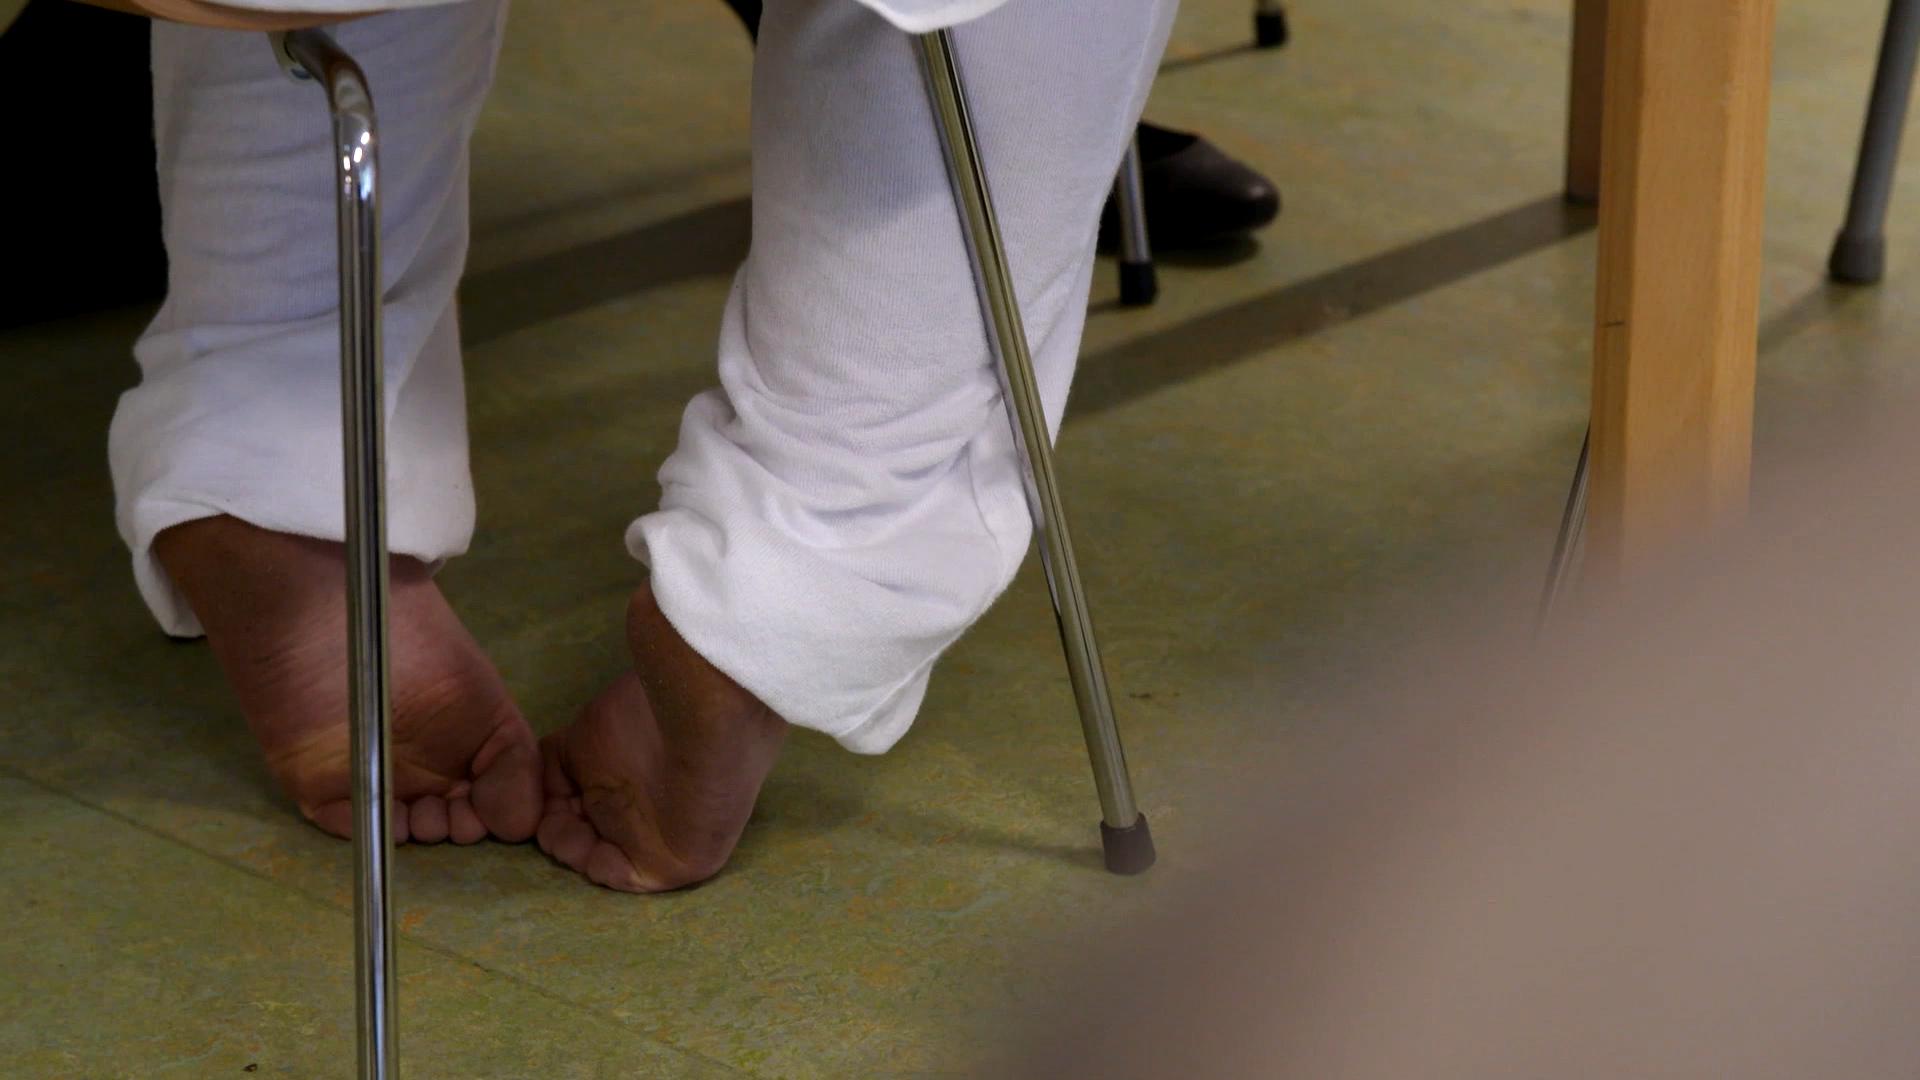 Rikkes fødder